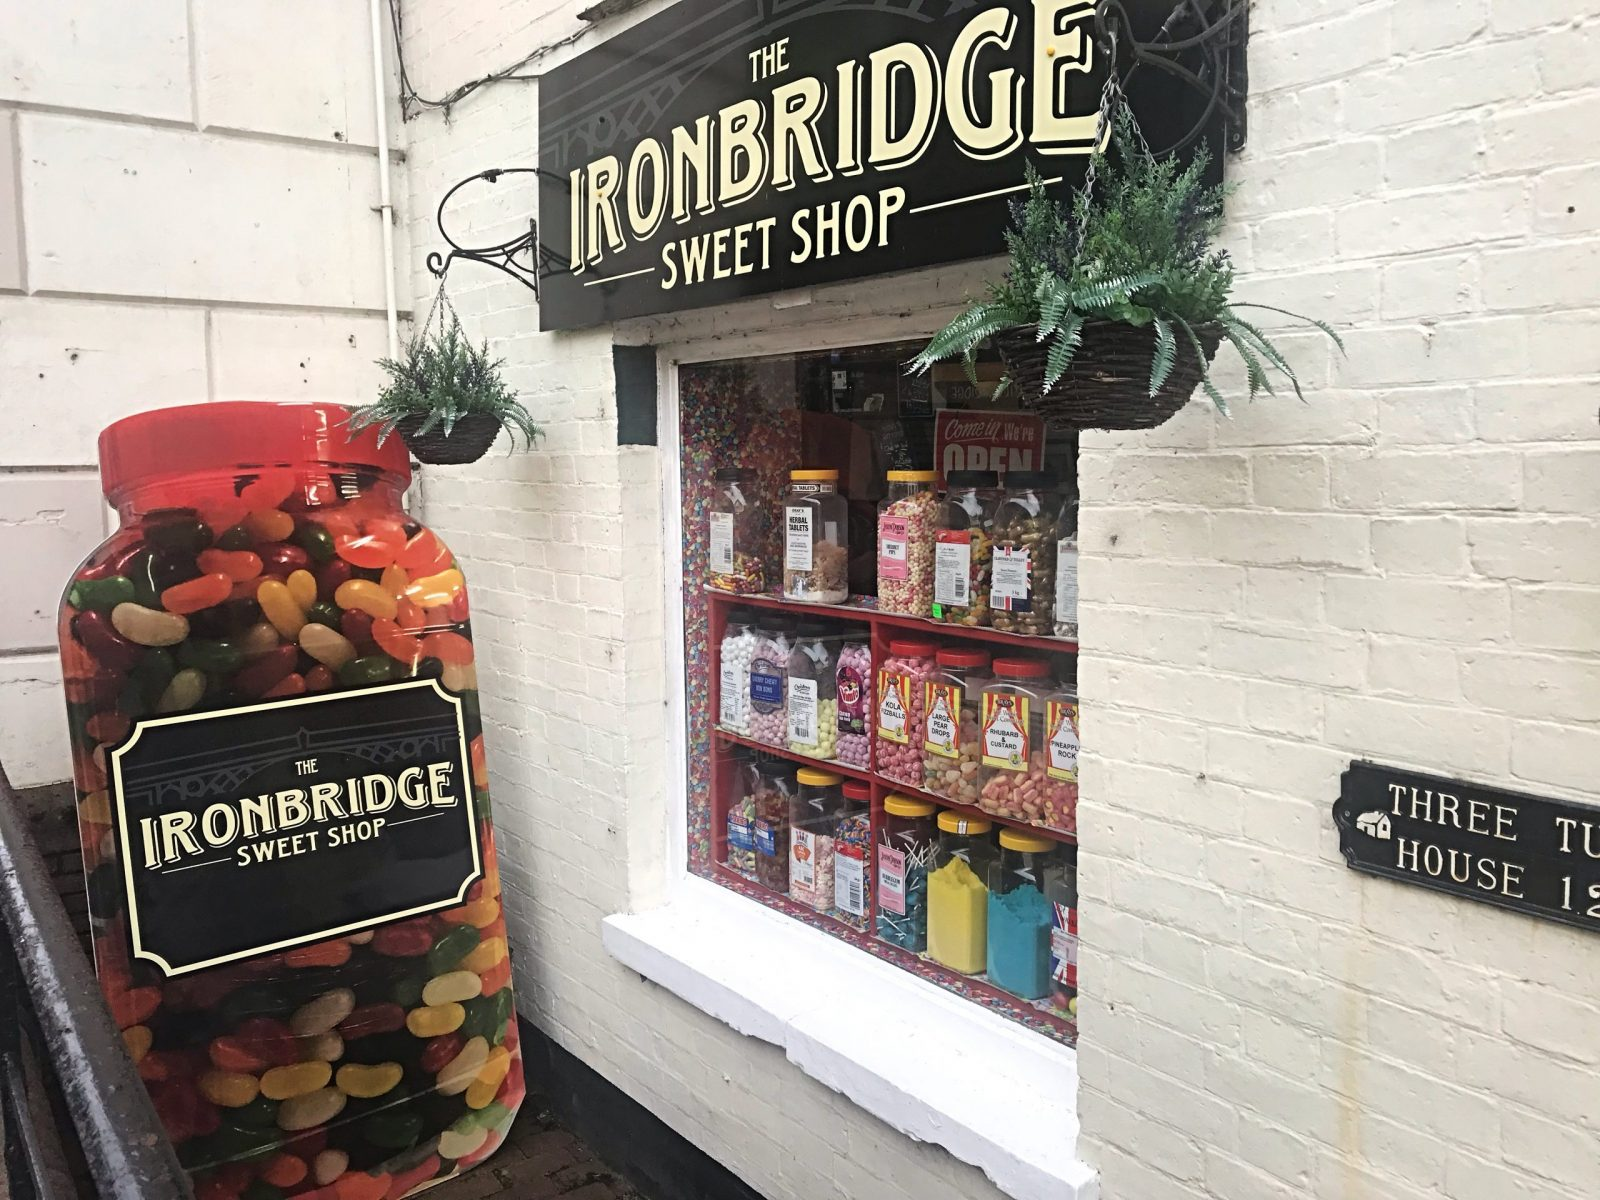 Visiting Ironbridge a 3 day itinerary Ironbridge sweet shop